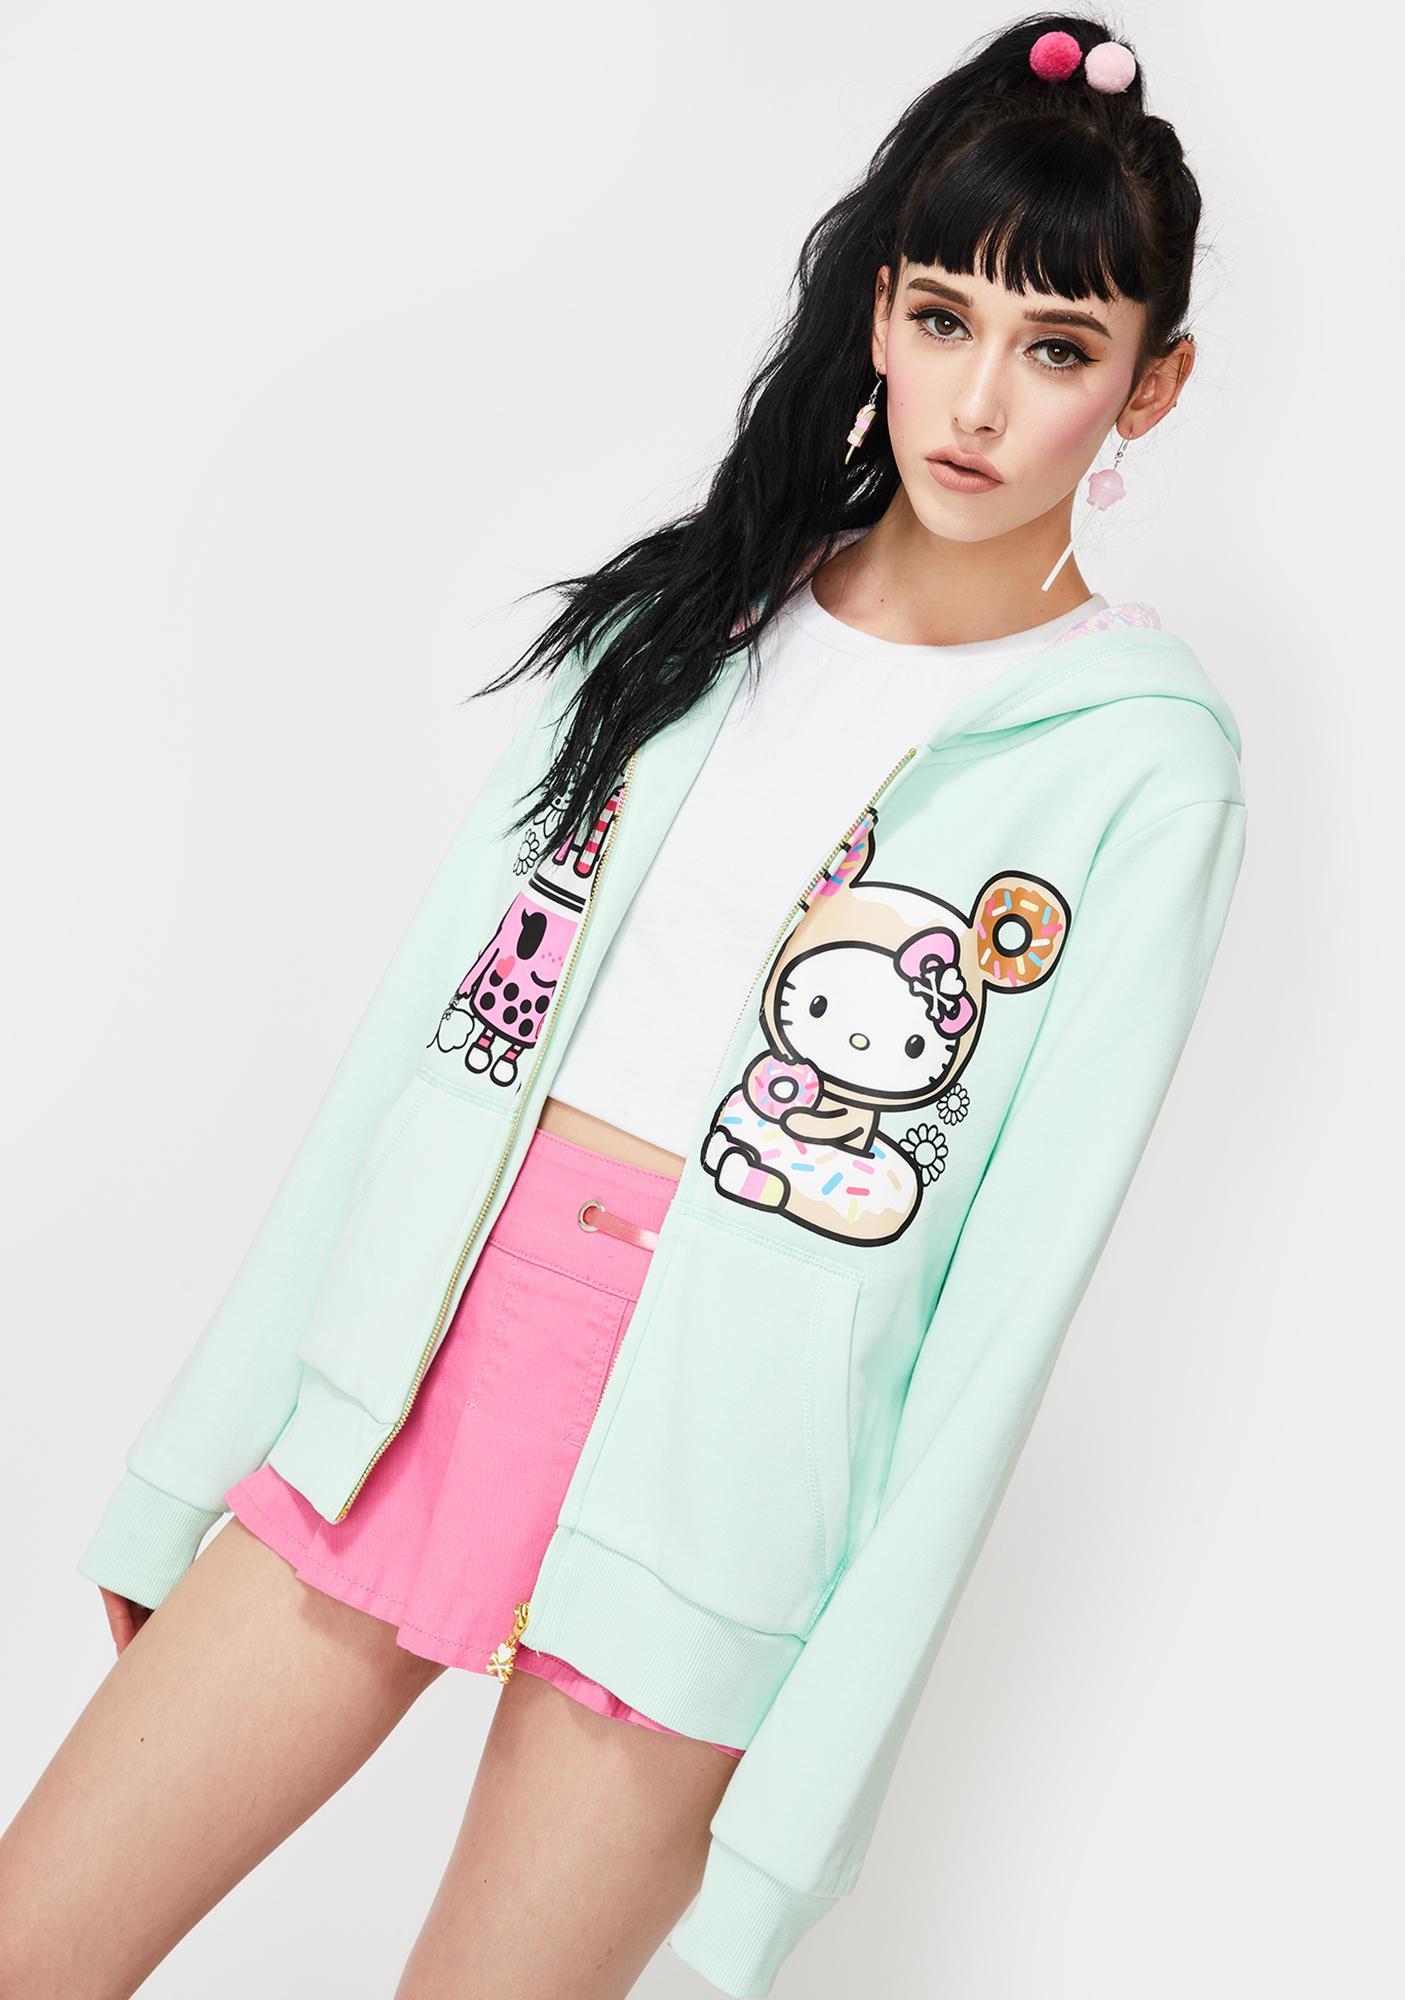 NEW Cool Baby Goth Punk Black white Yellow Pink tokidoki style T-shirt Top Gift